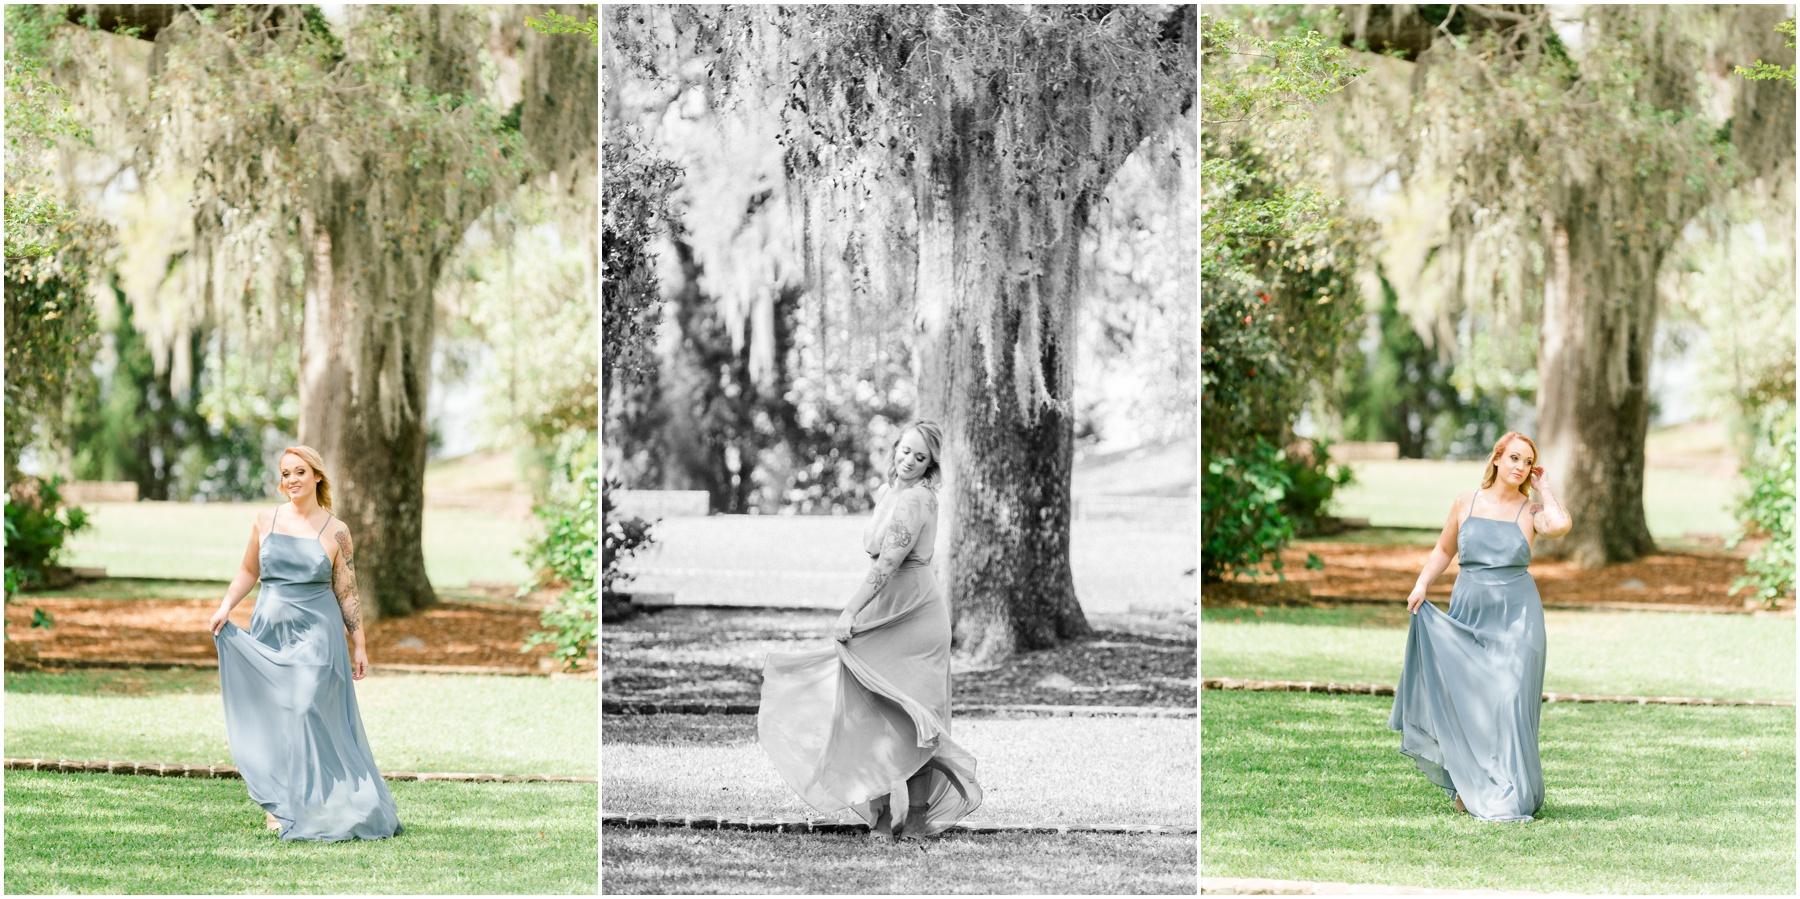 Mepkin-Abbey-Moncks-Corner-South-Carolina-Engagement-Session-Photos_0004.jpg